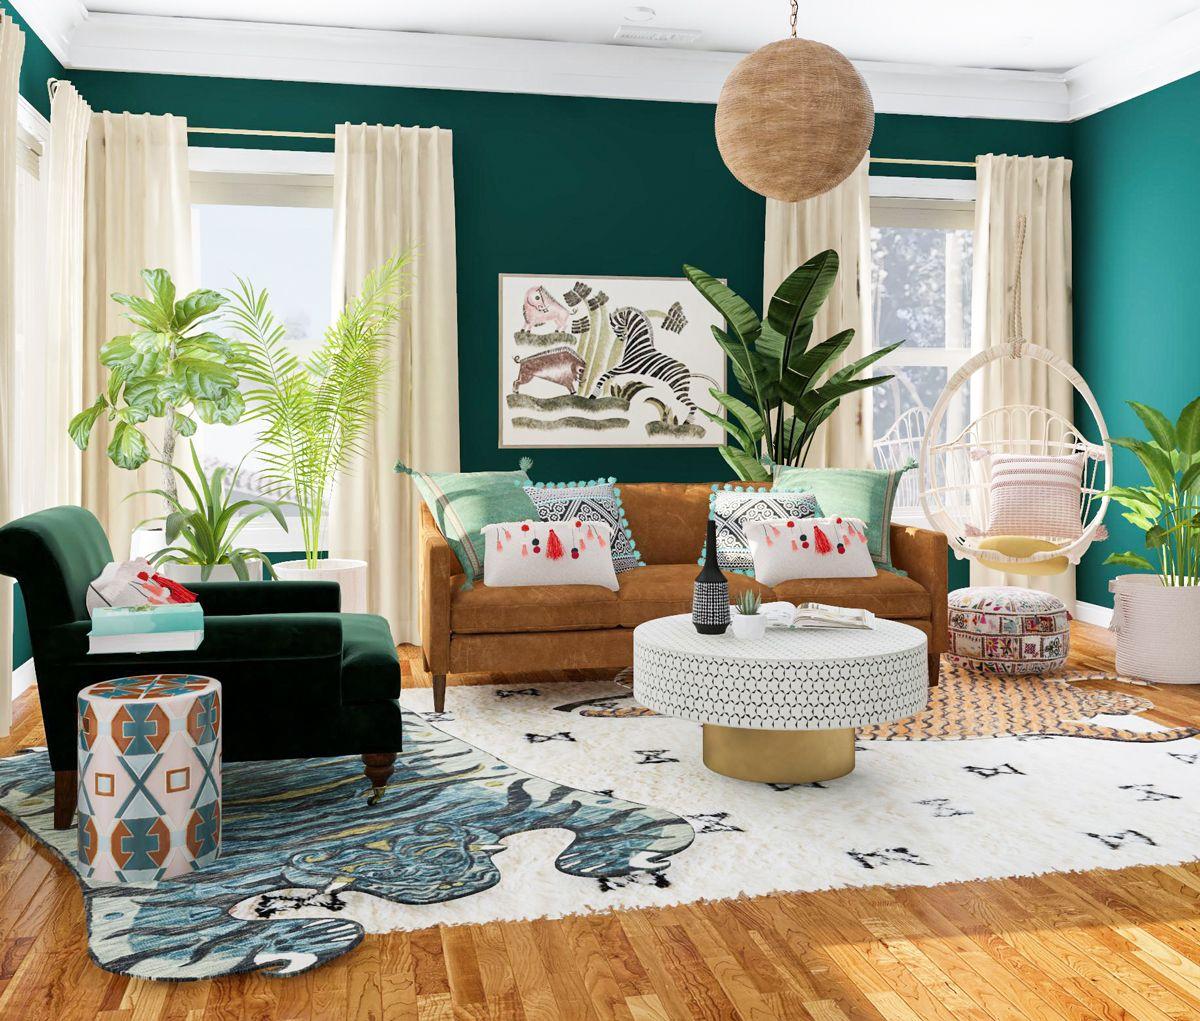 17 Best Living Room Design Ideas Of 2019 Modsy Blog Colou